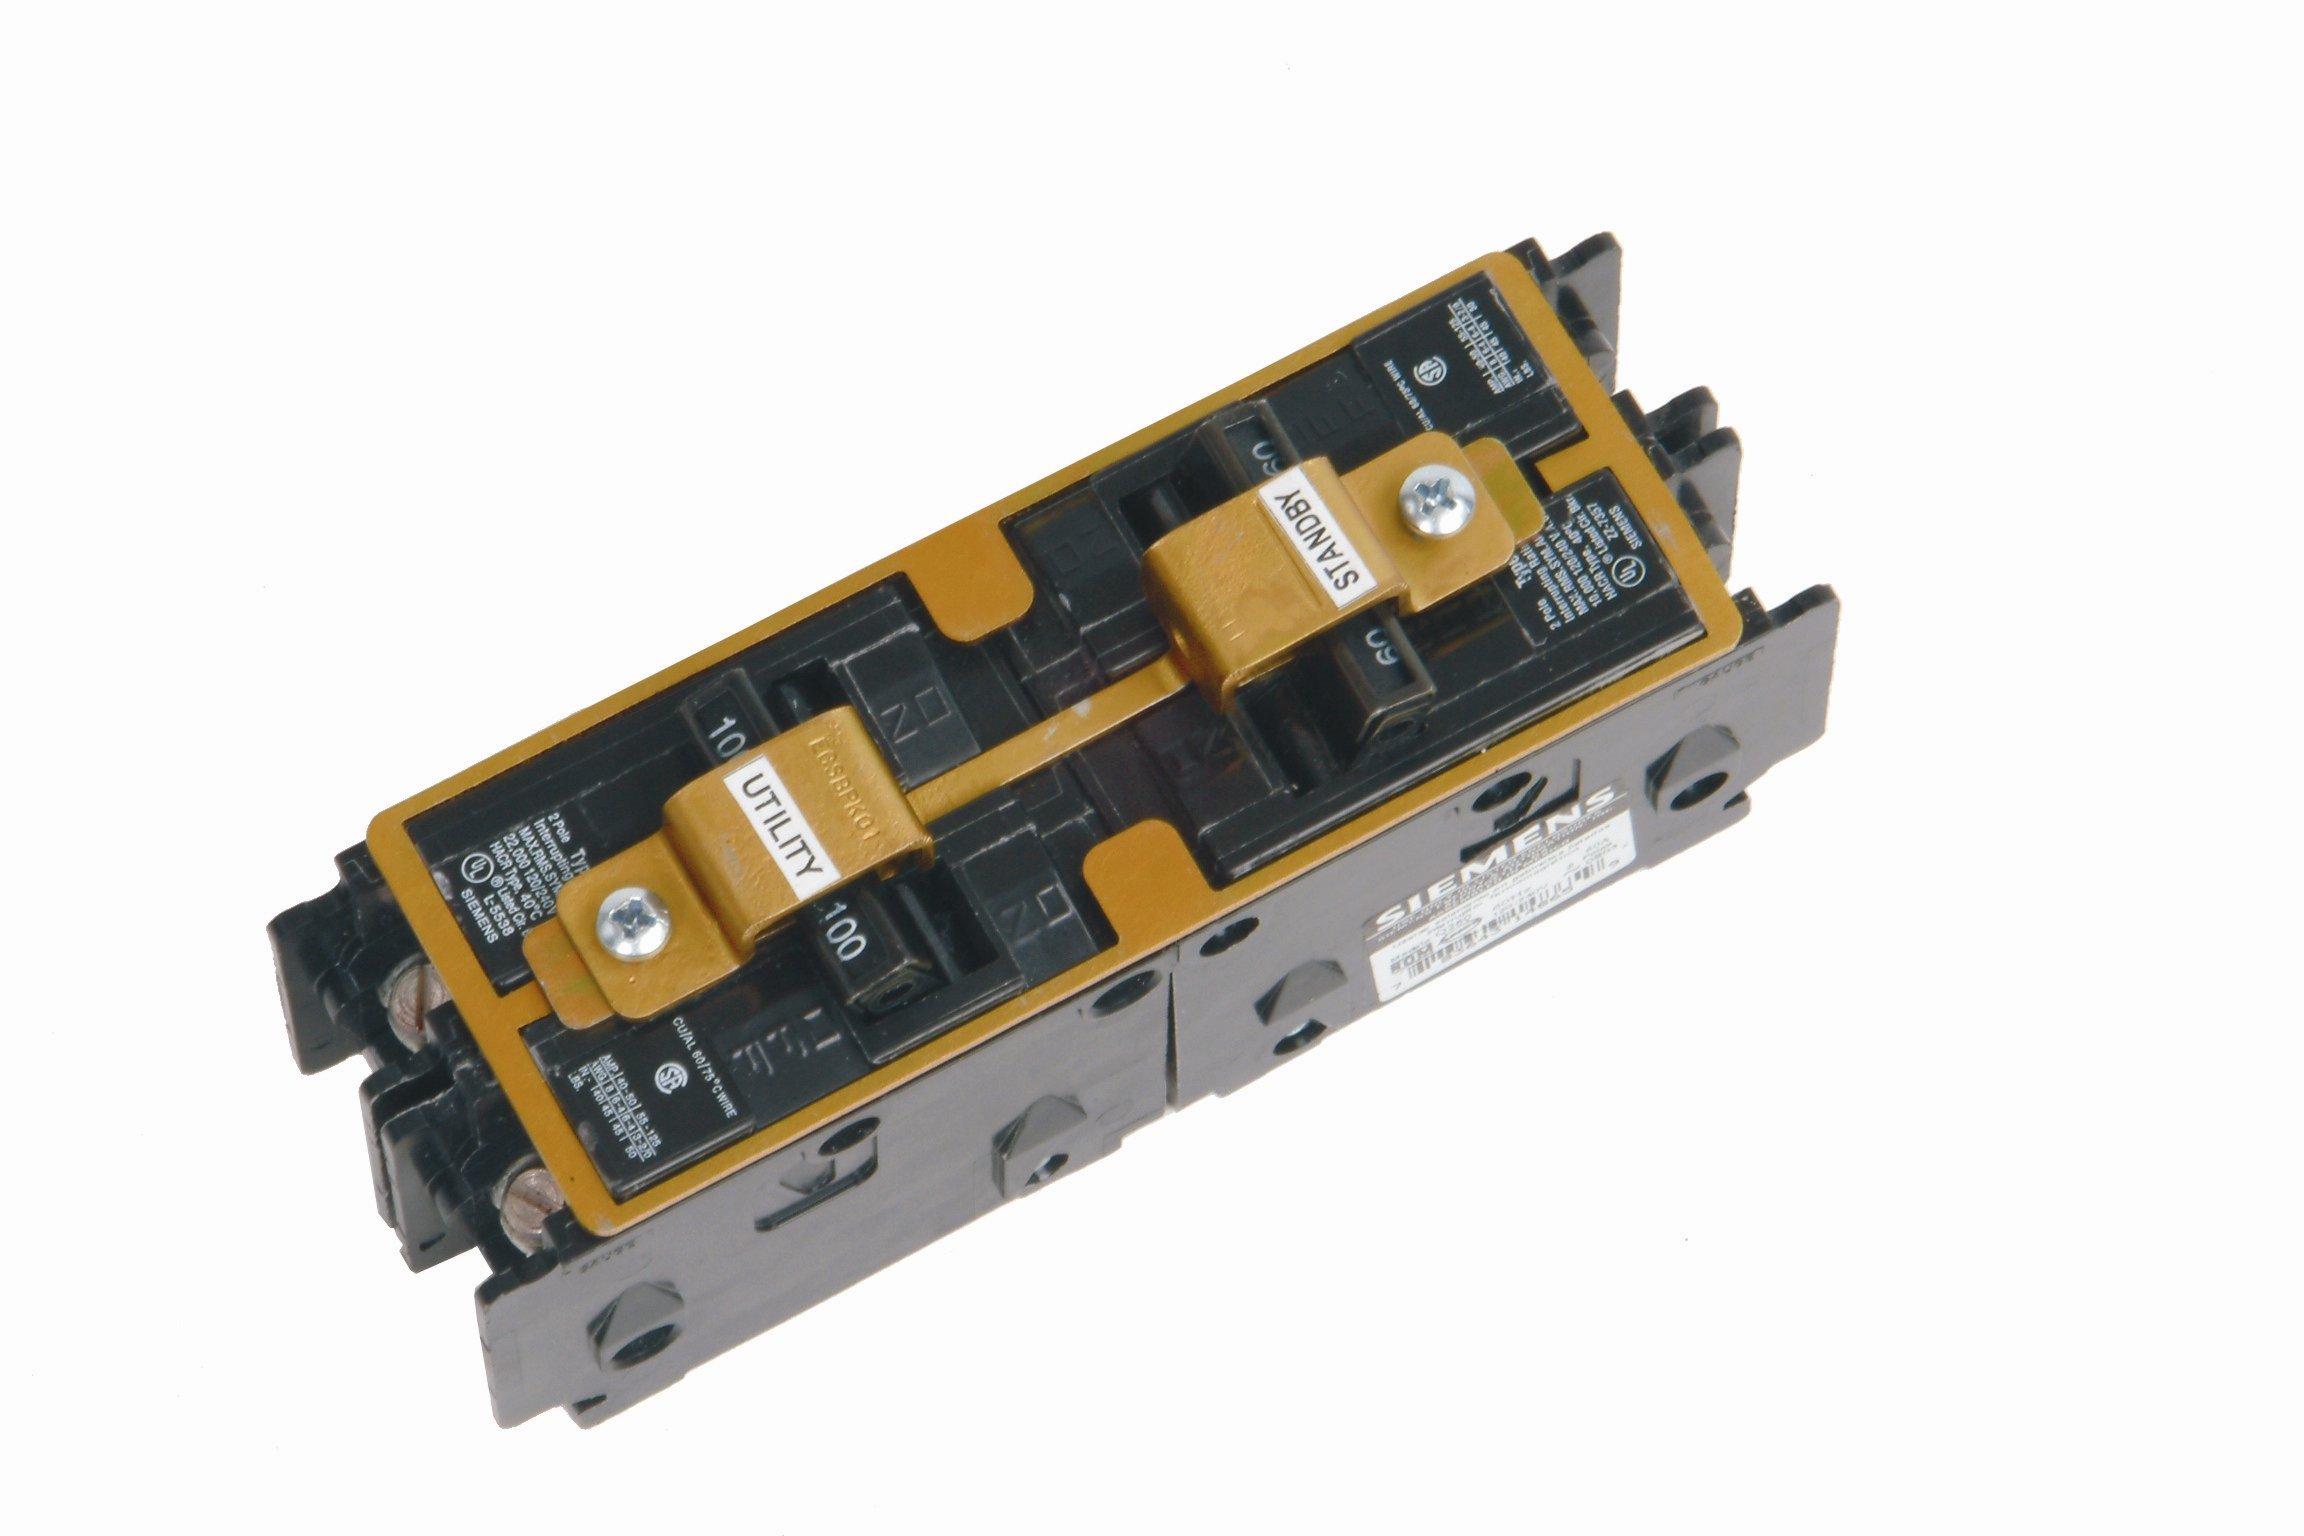 Siemens ECSBPK01 Generator Standby Power Mechanical Interlock by SIEMENS